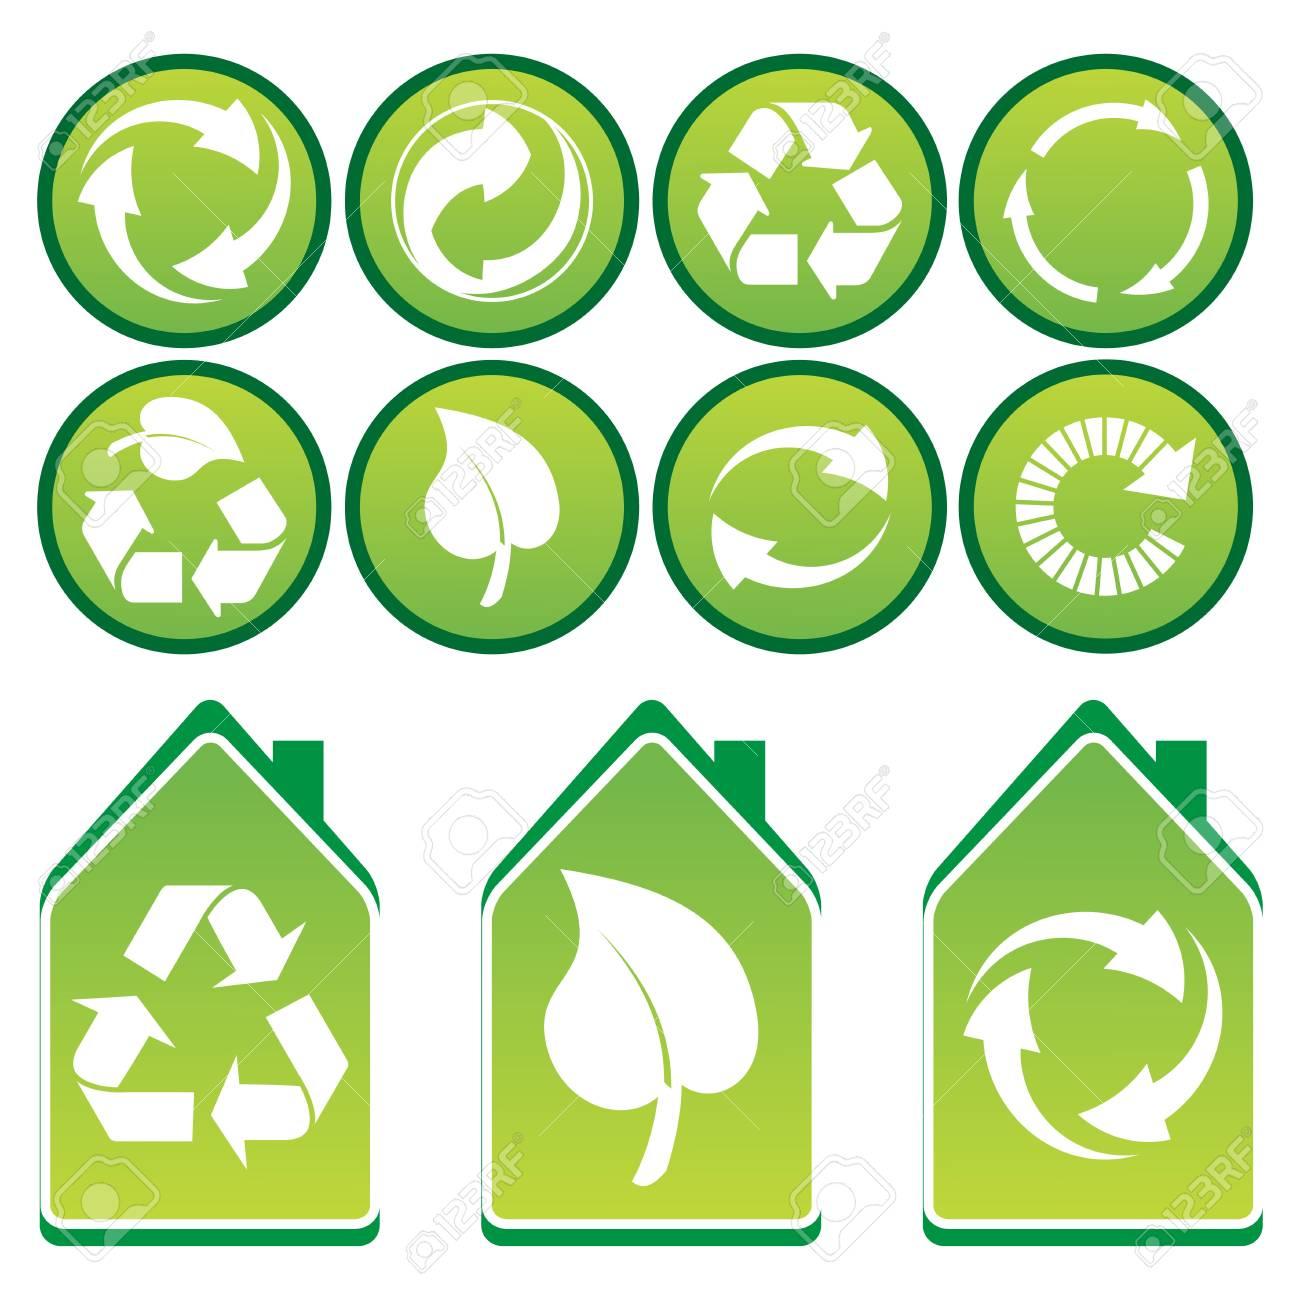 Vector set of environmental / recycling icons Stock Photo - 4394674